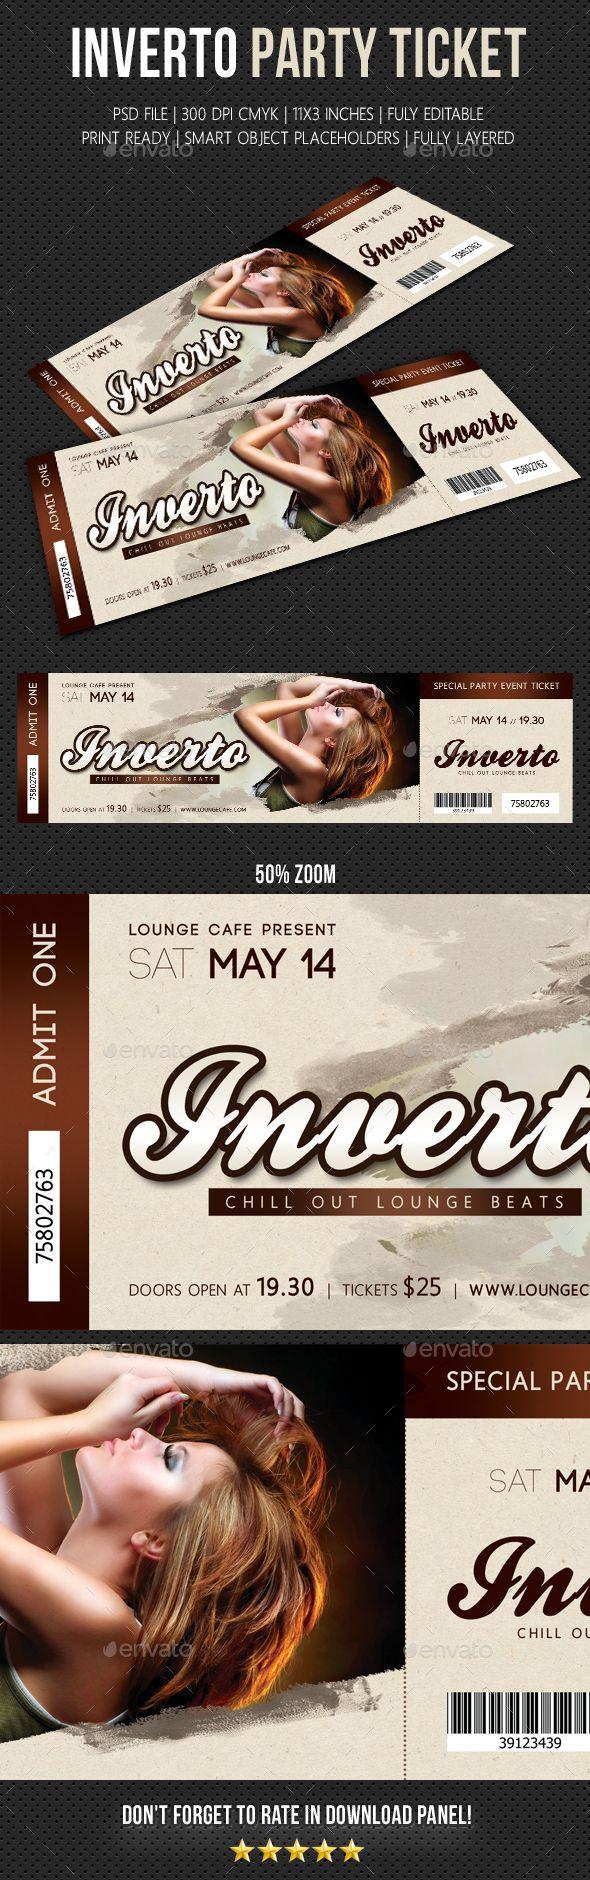 Inverto Party Event Ticket V2